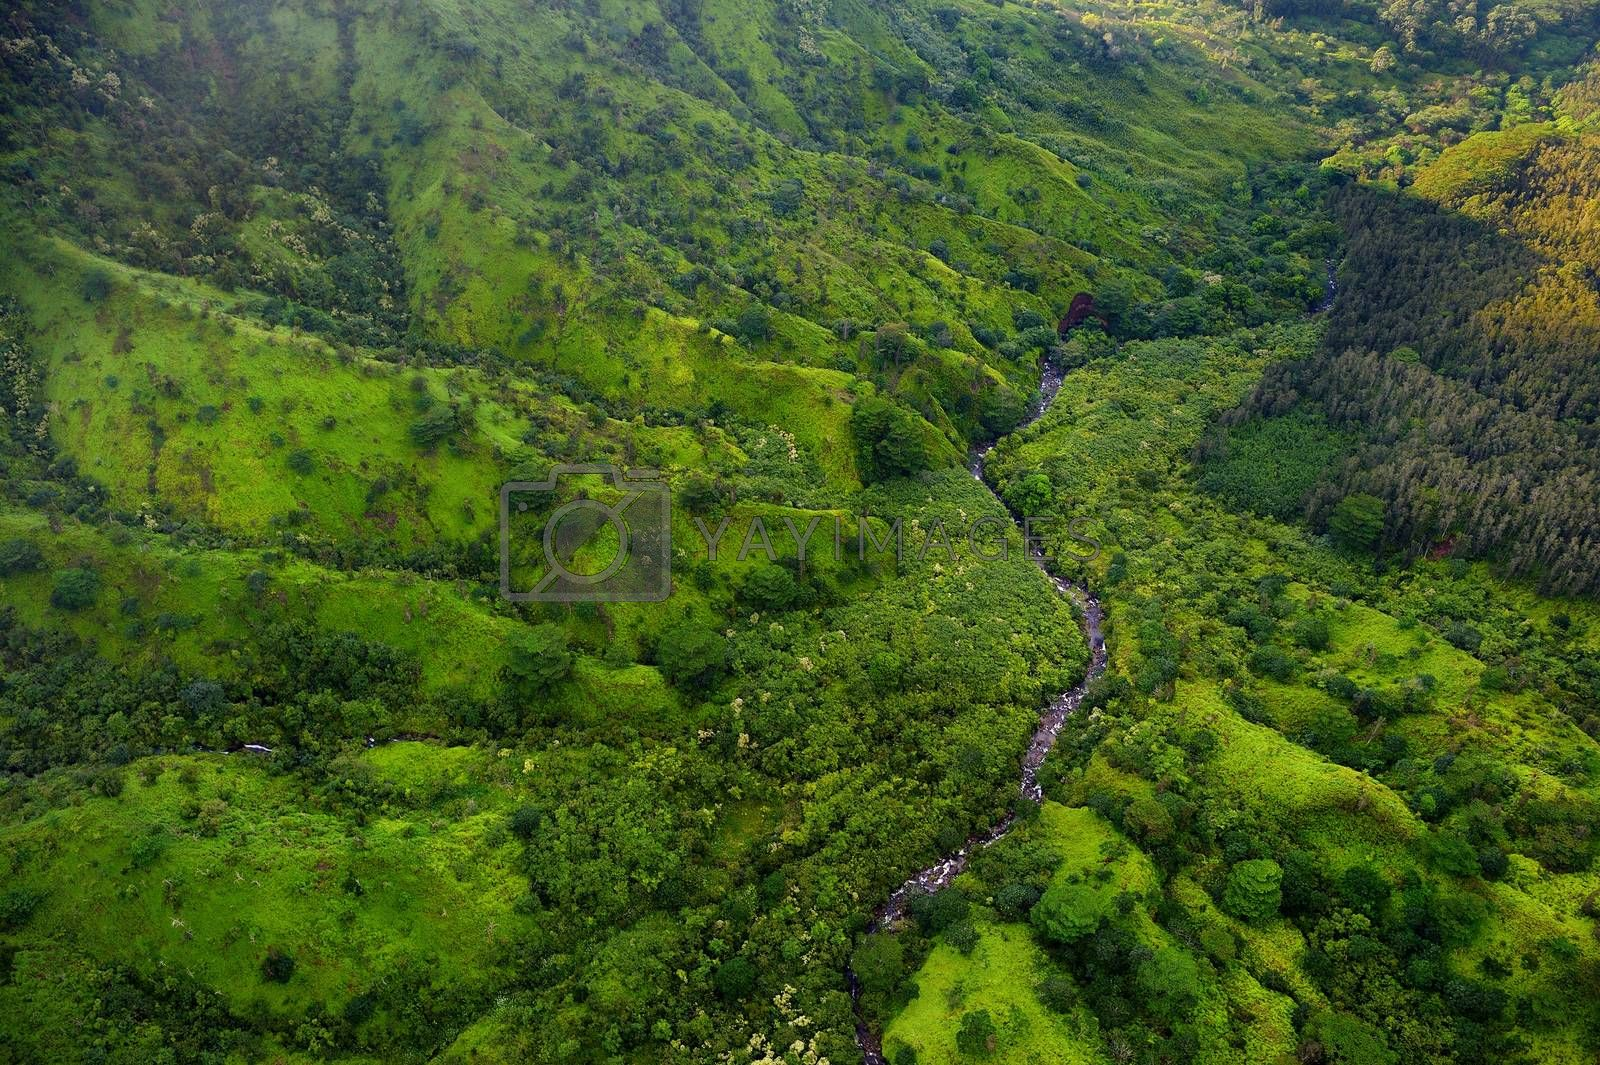 Stunning aerial view of spectacular jungles, Kauai, Hawaii